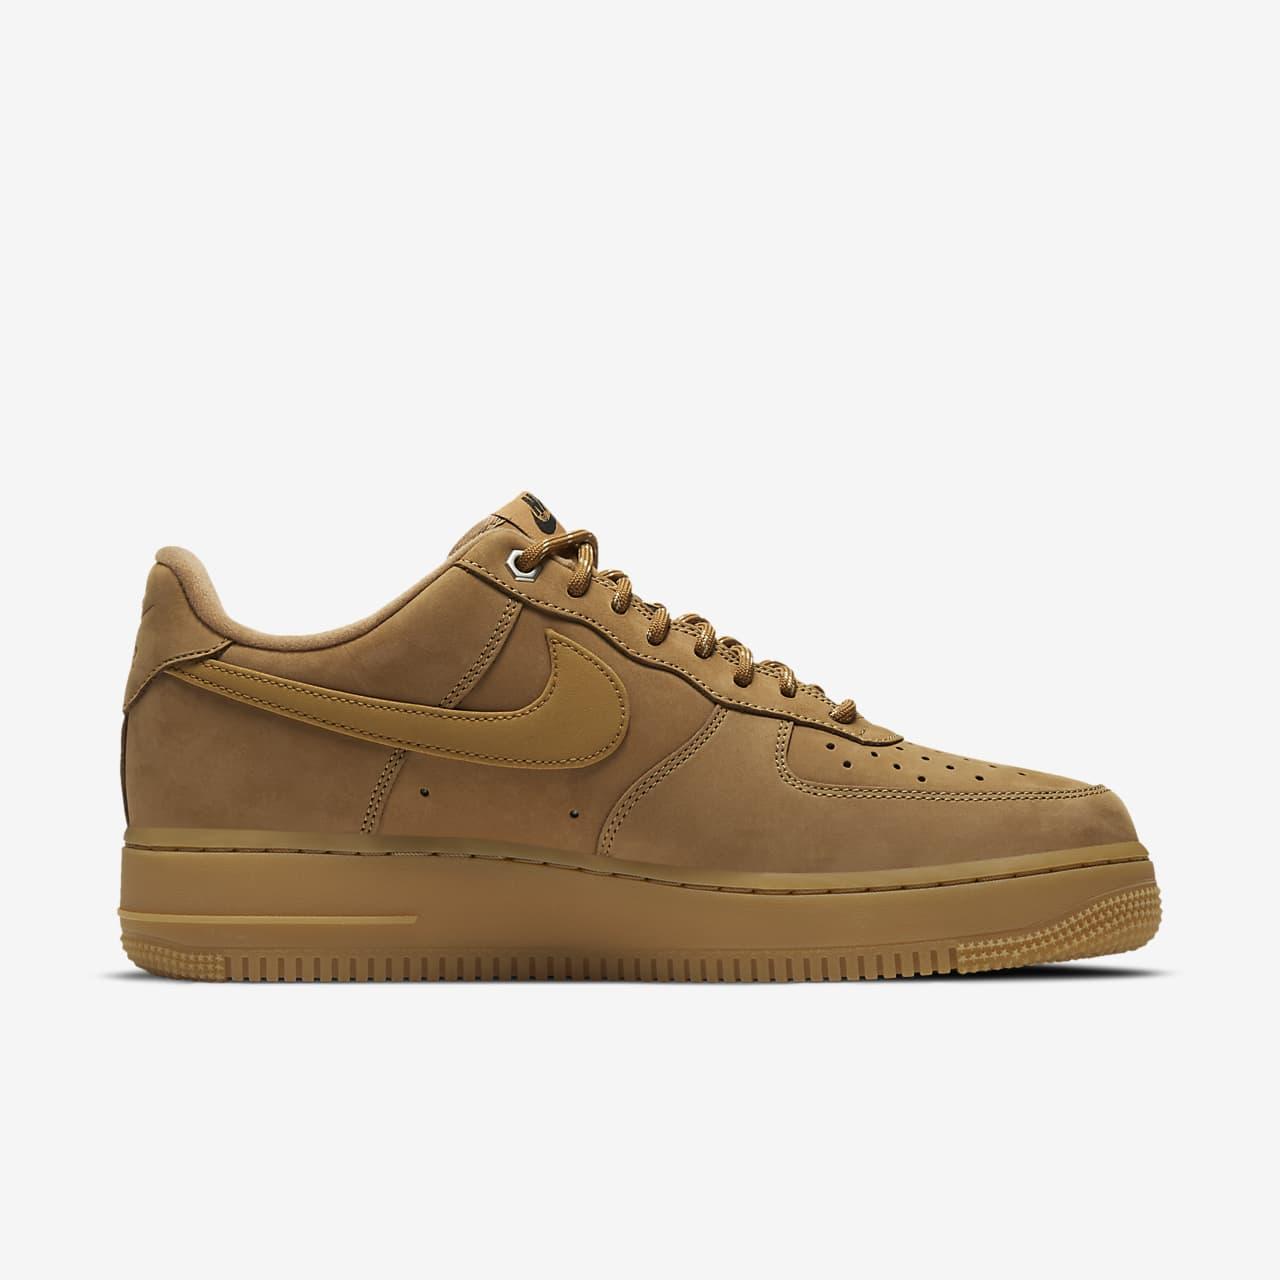 Latest Sneaker Pickup: Nike Air Force 1 High LV8 Flax